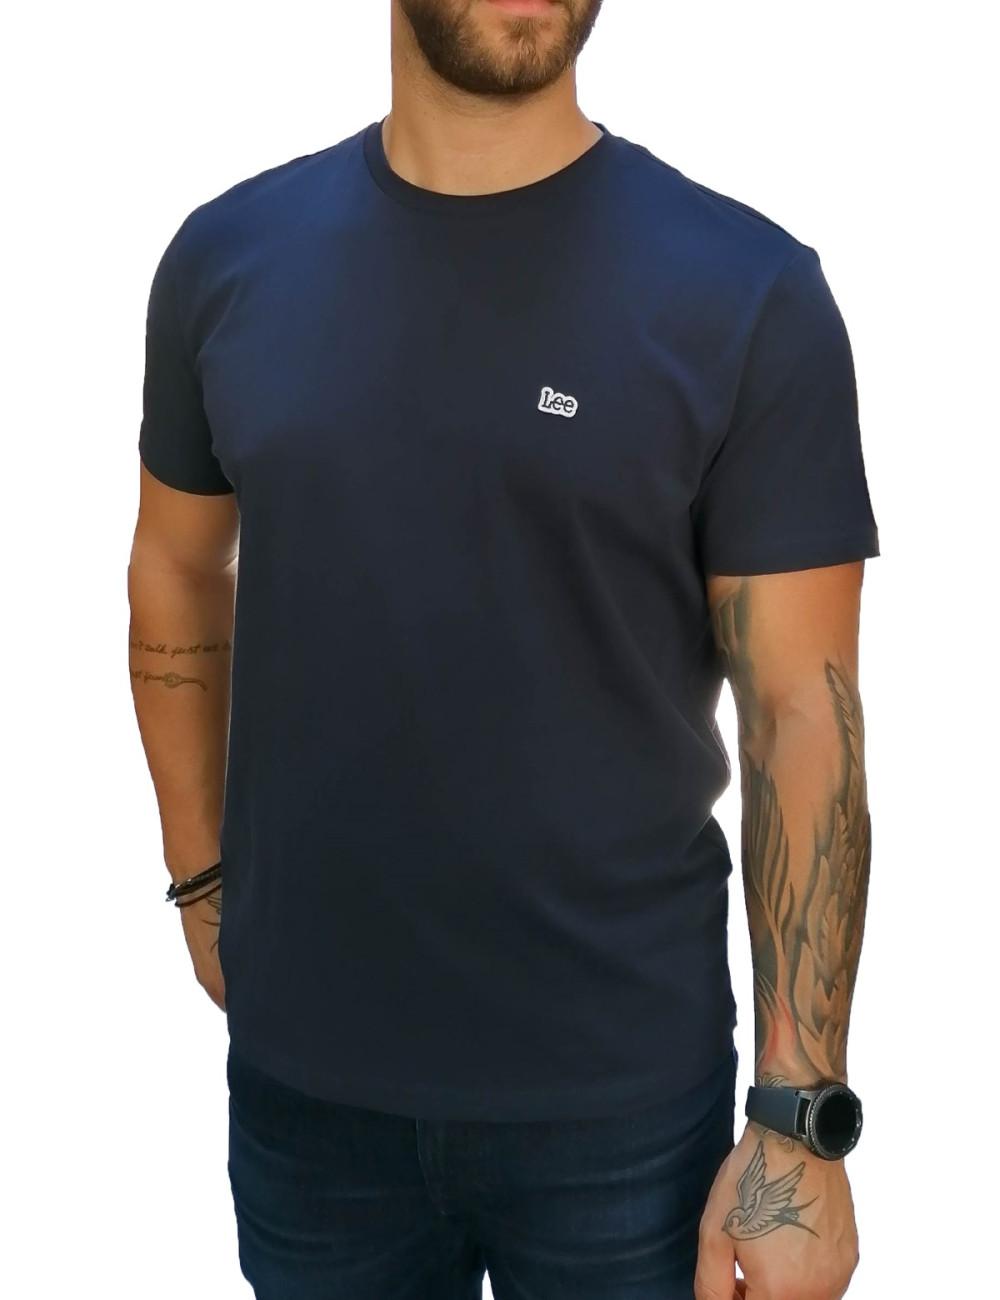 Lee SS Pach Logo Tee ανδρικό μπλε μπλουζάκι L60UFQ35